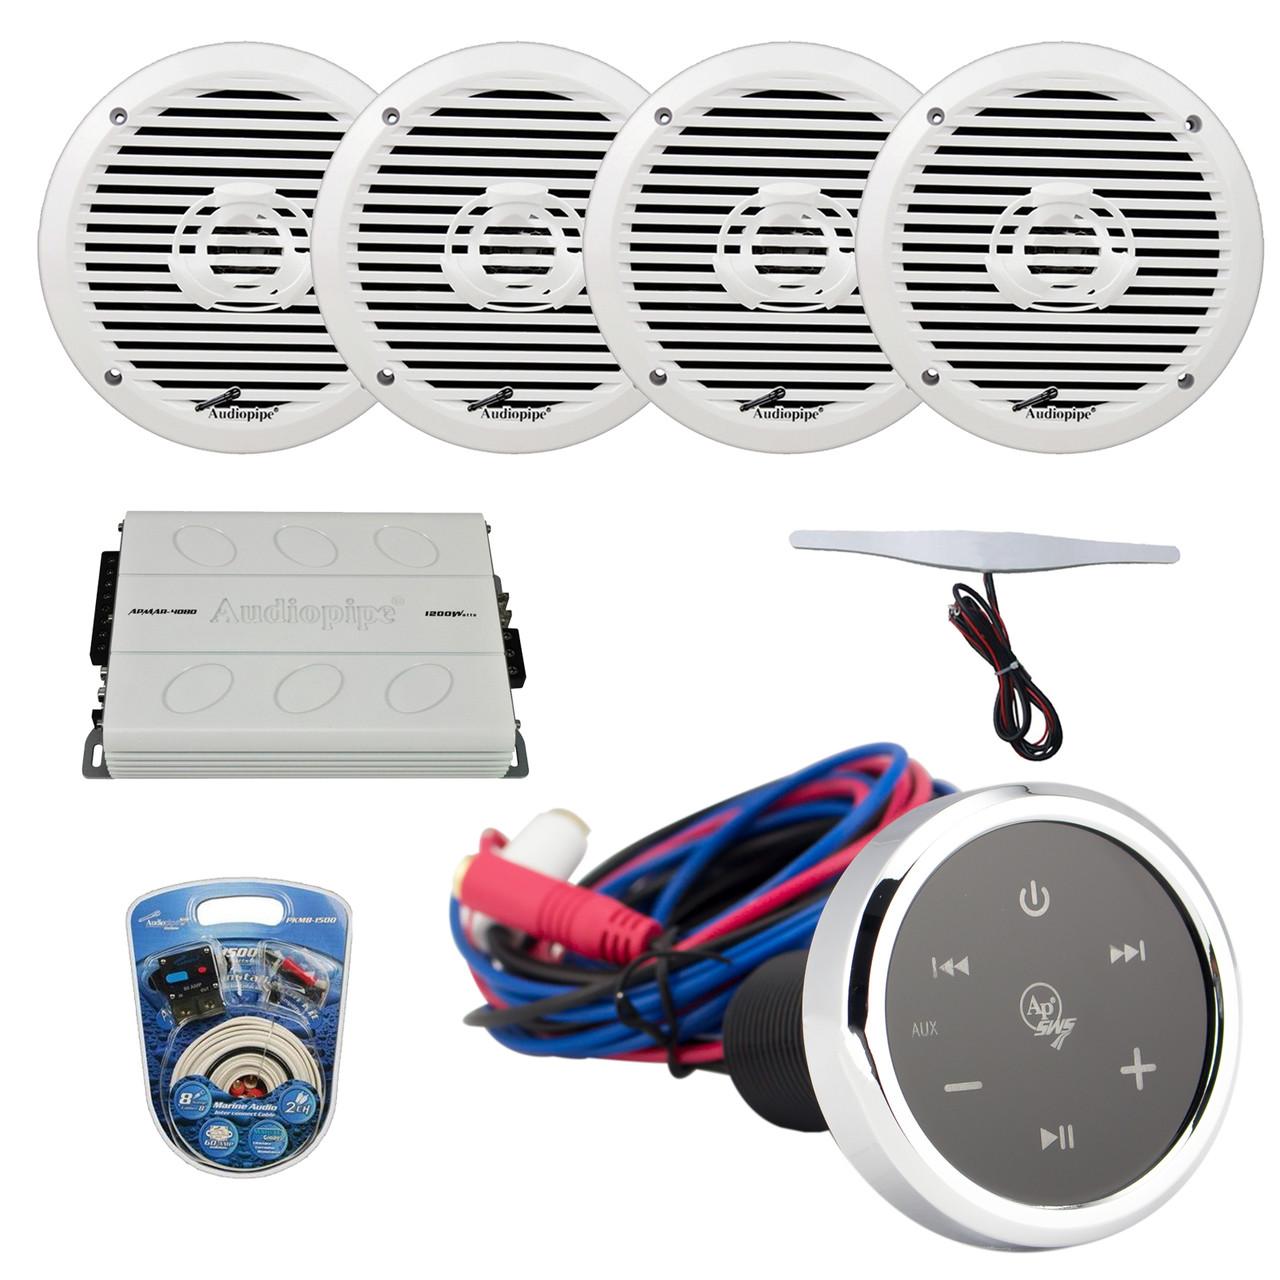 Audiopipe Amp Wiring Diagram Electrical Diagrams Visonik Marine Bluetooth Audio Receiver 4x 6 5 2 Way White 200